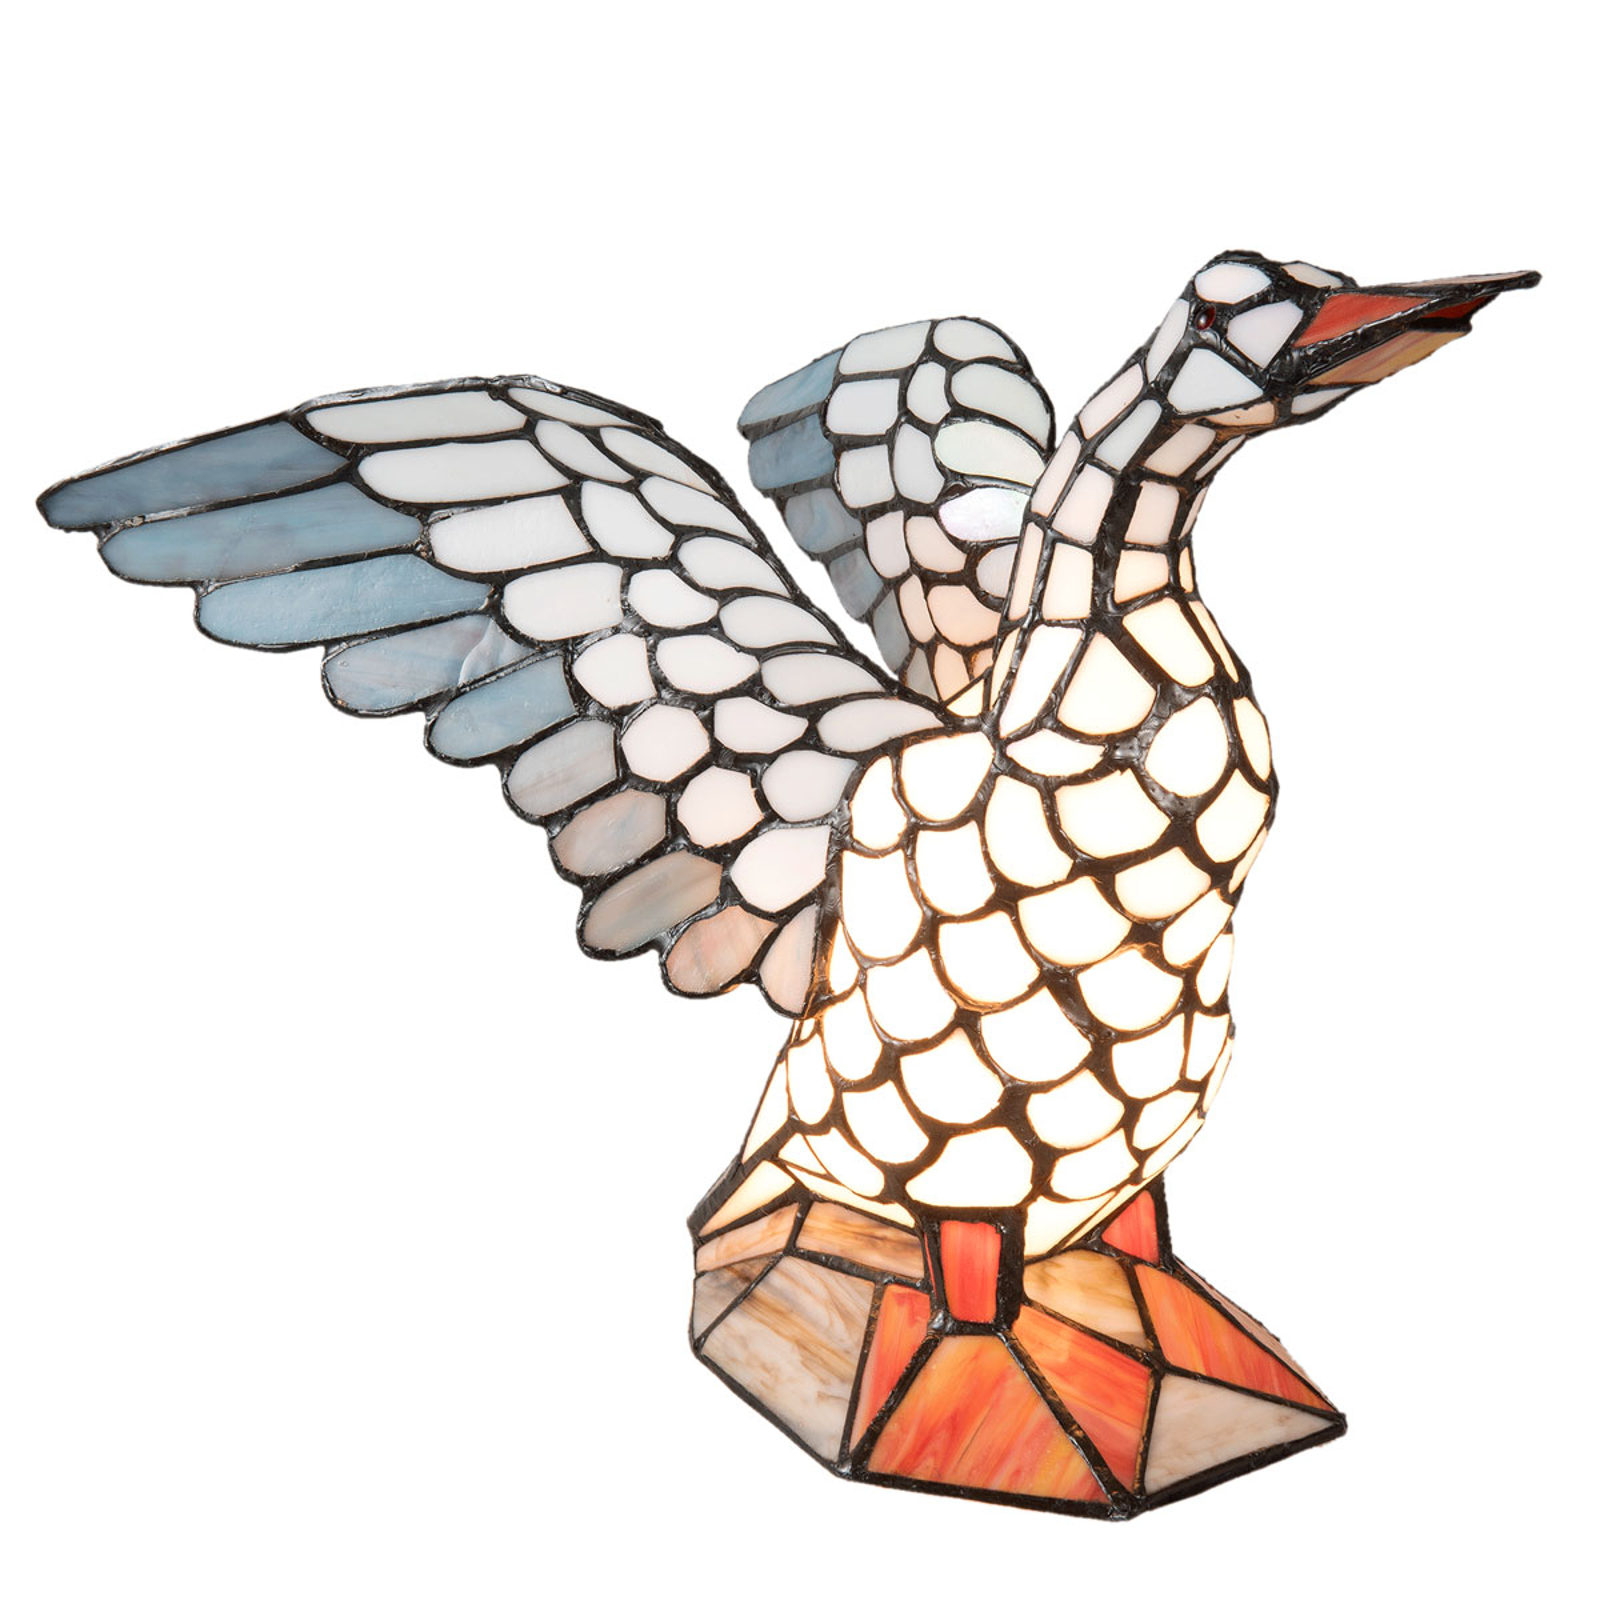 Tafellamp 5928 vorm van een gans, Tiffany-stijl